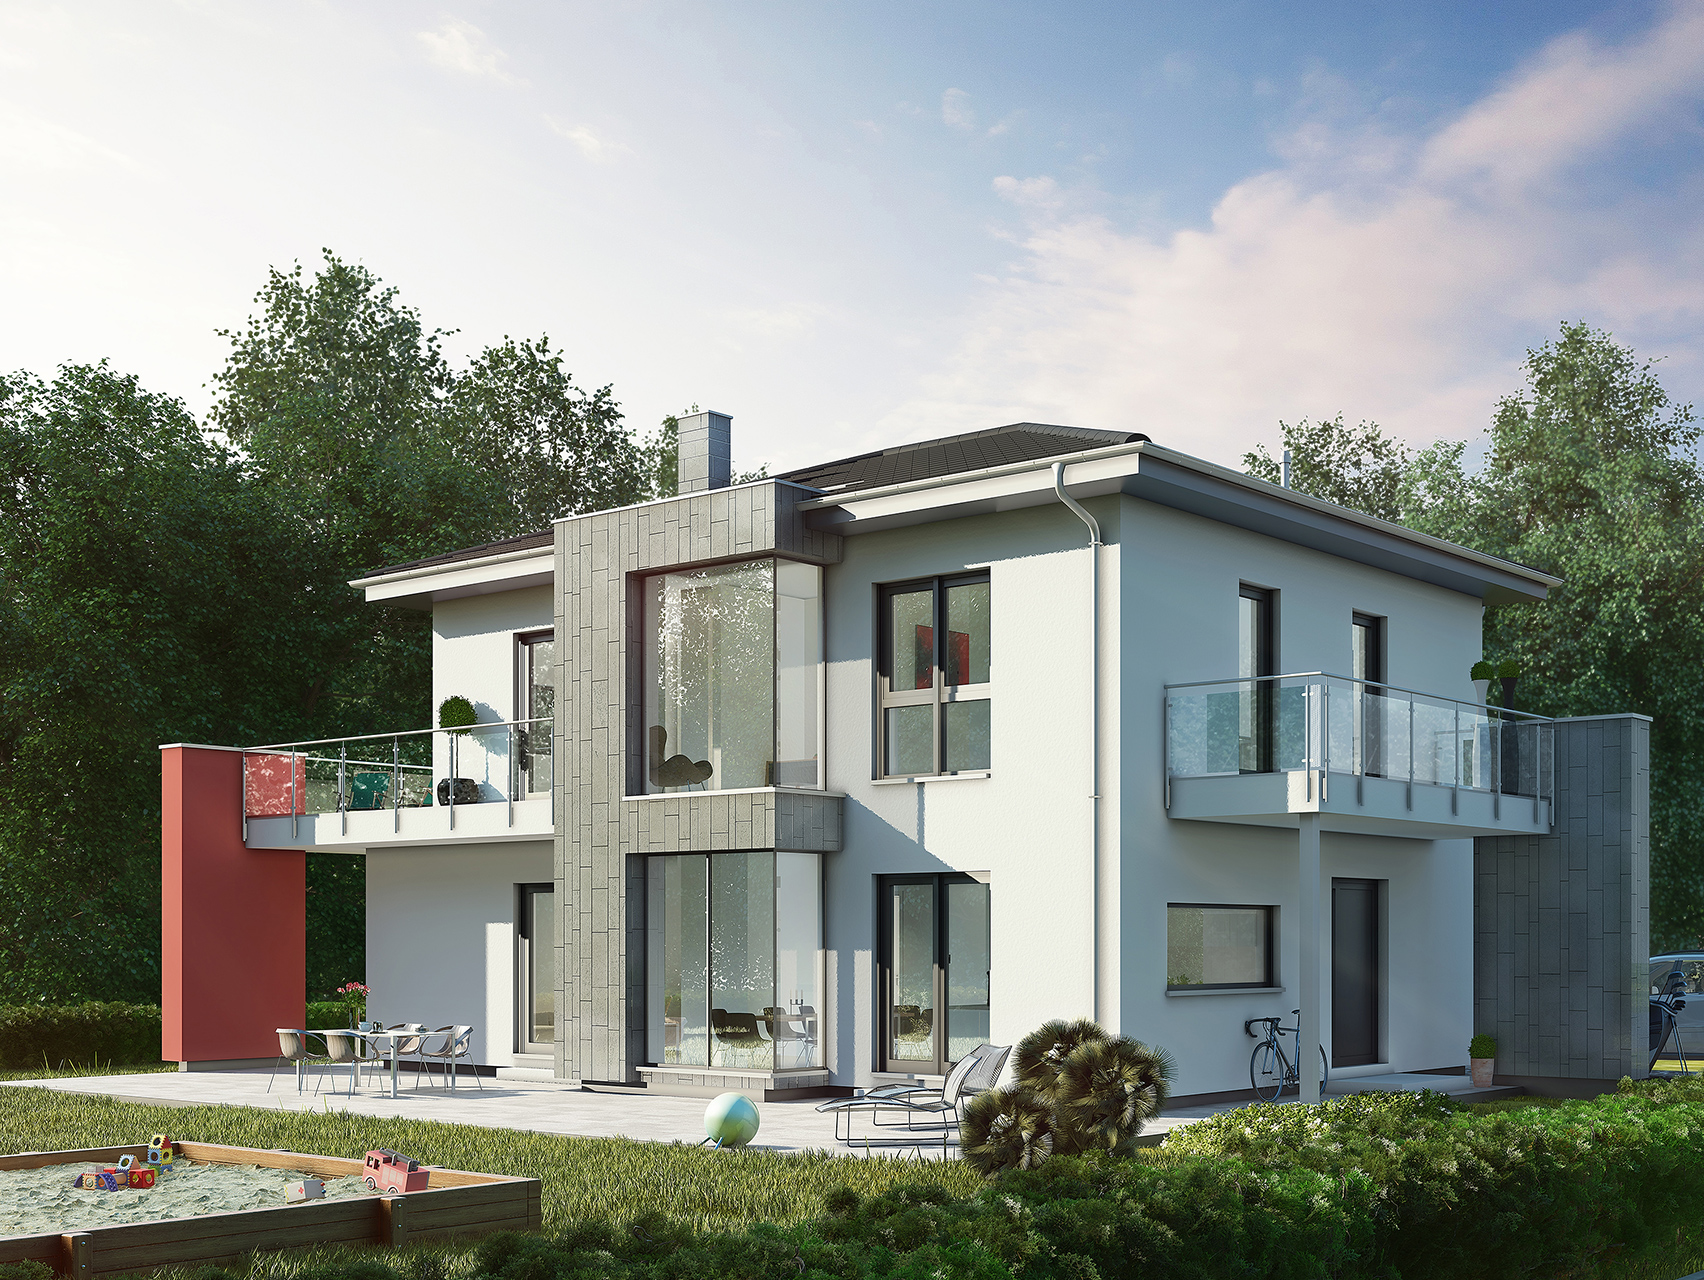 Moderne stadtvilla walmdach  planungsvorschlag_family-classic-walmdach_43_9sp_1704x1280.jpg